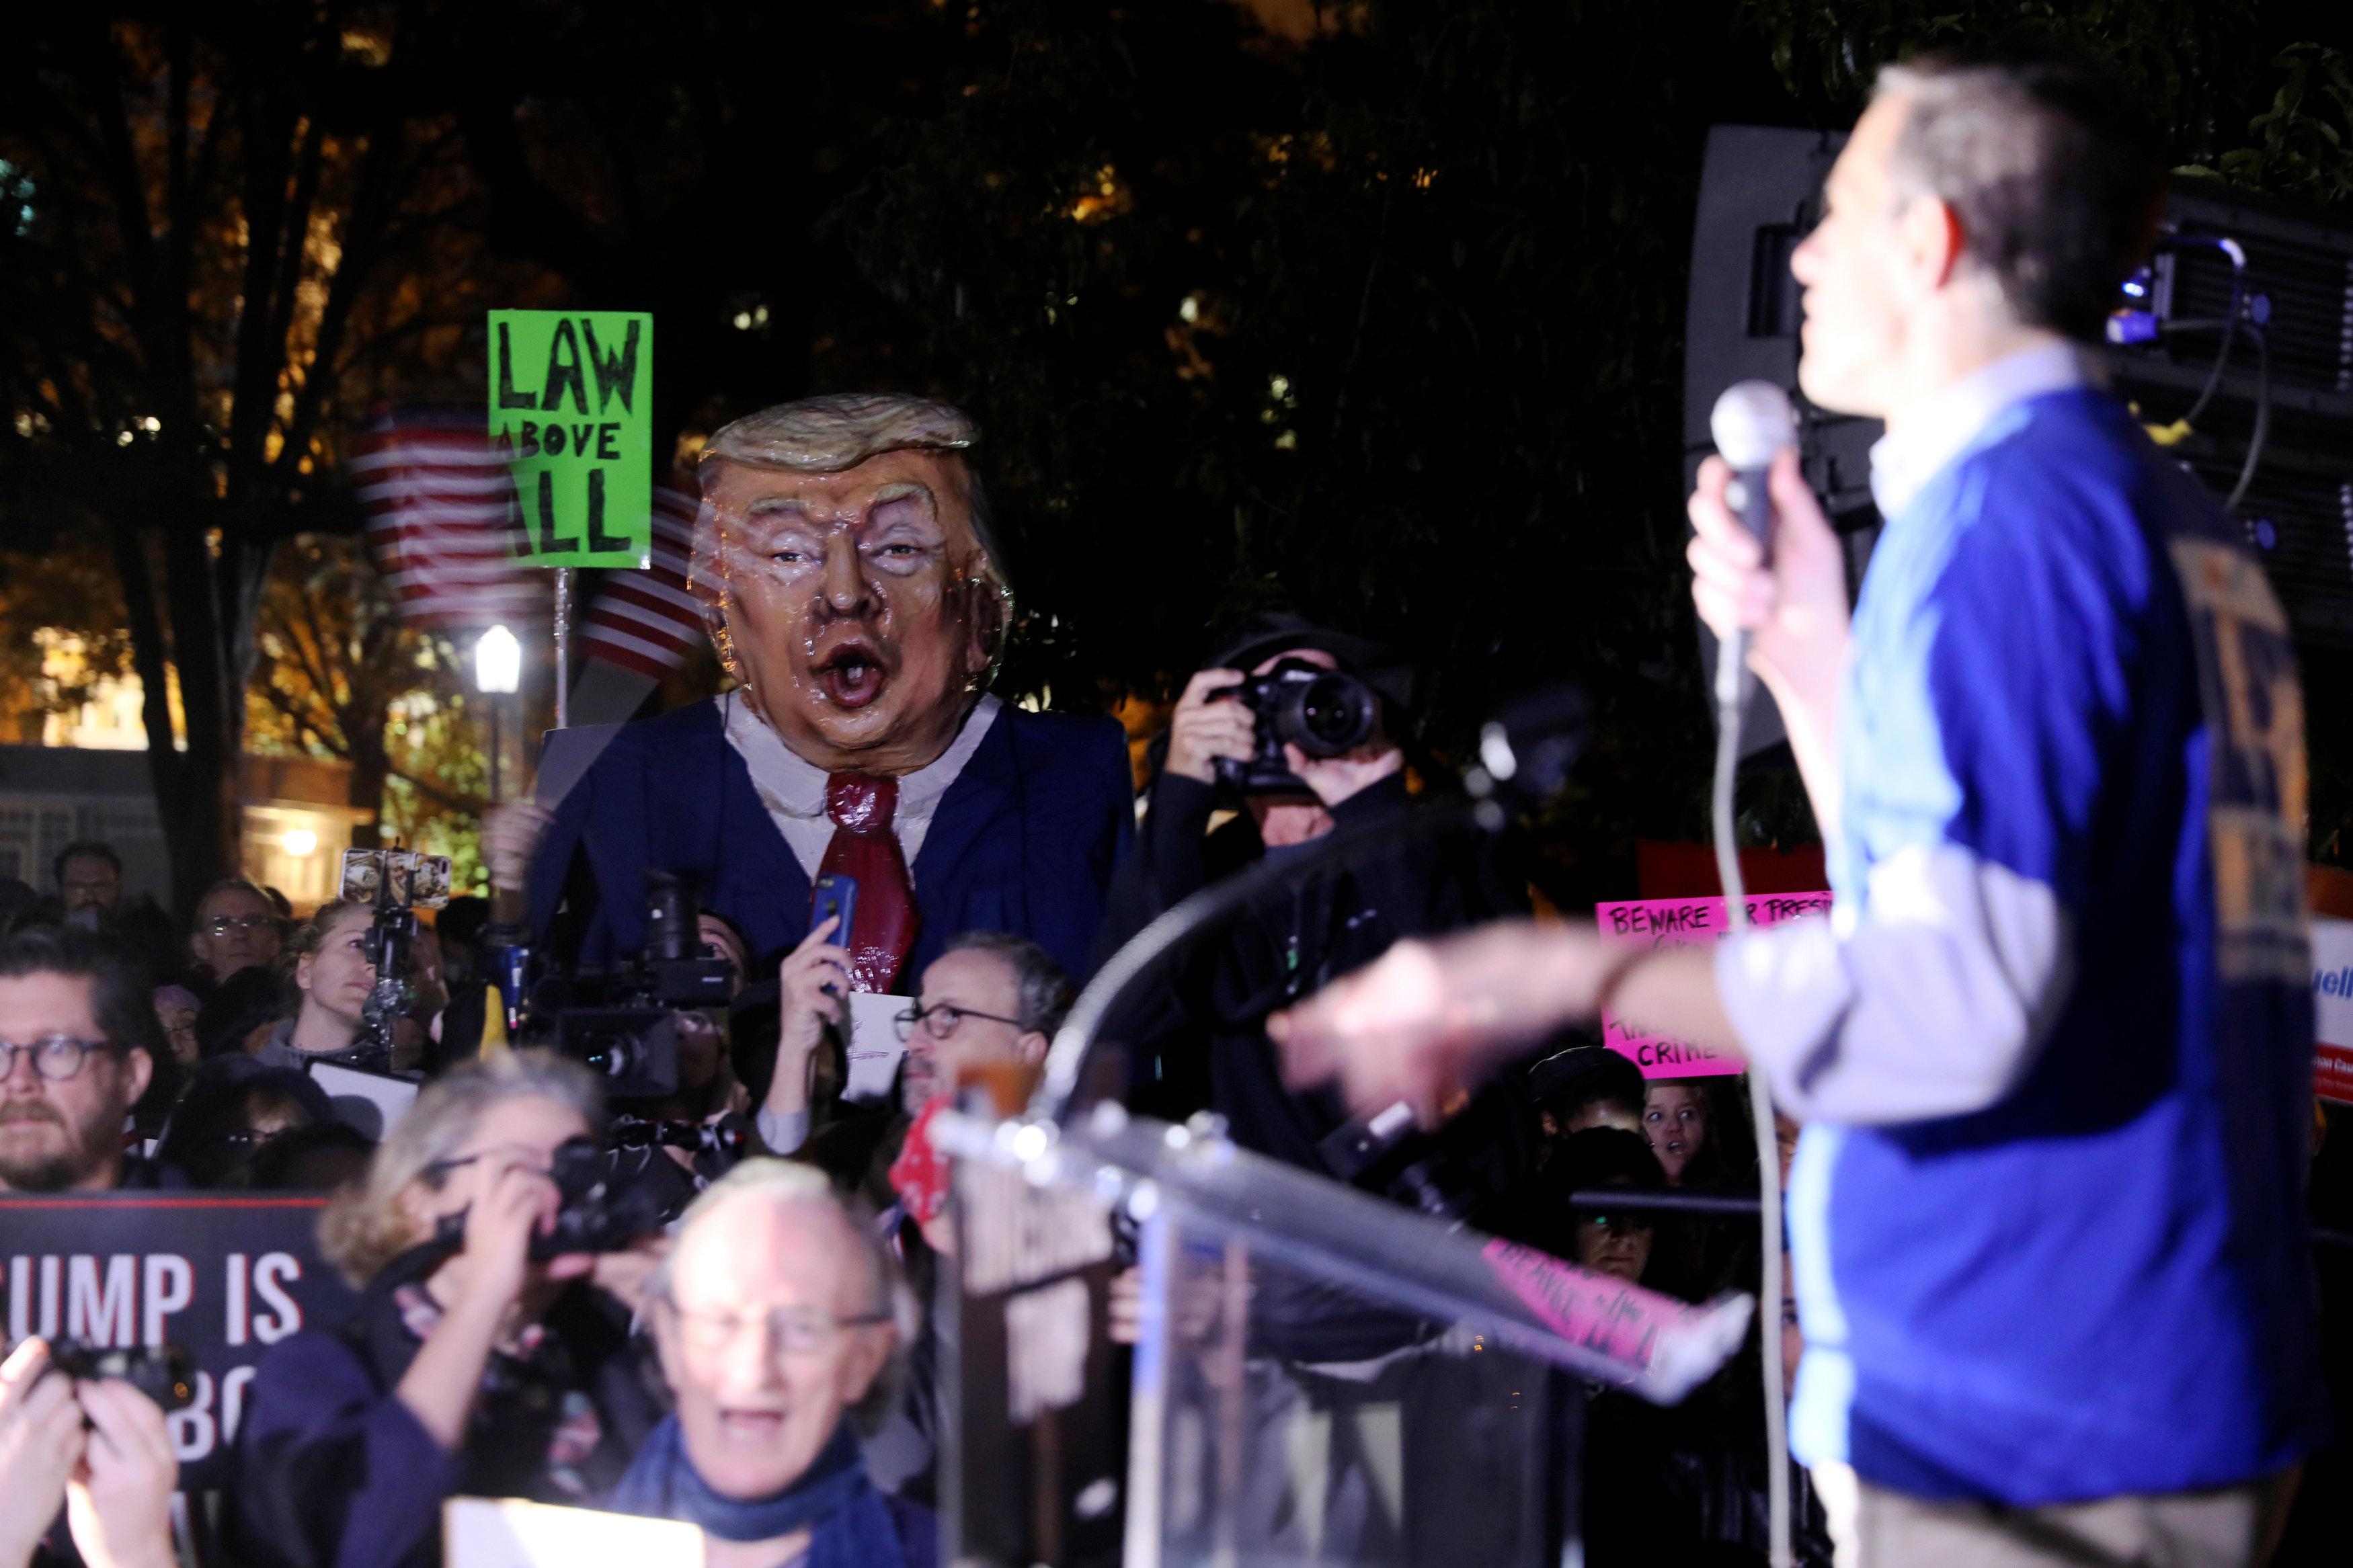 فعاليات منددة ضد ترامب